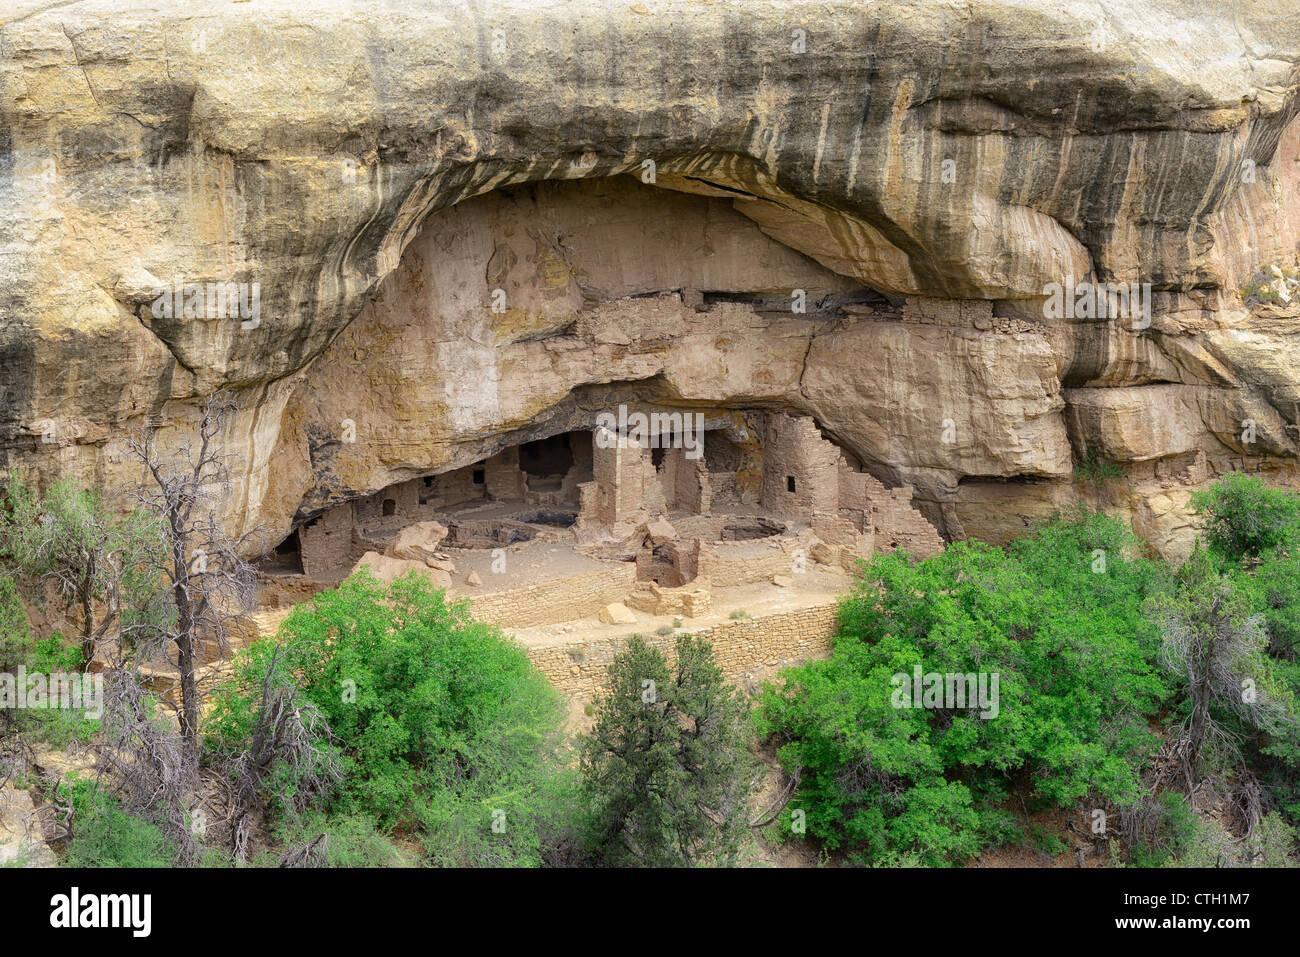 Oak Tree House, Native American Cliff Dwellings, Mesa Verde National Park, Colorado, USA - Stock Image